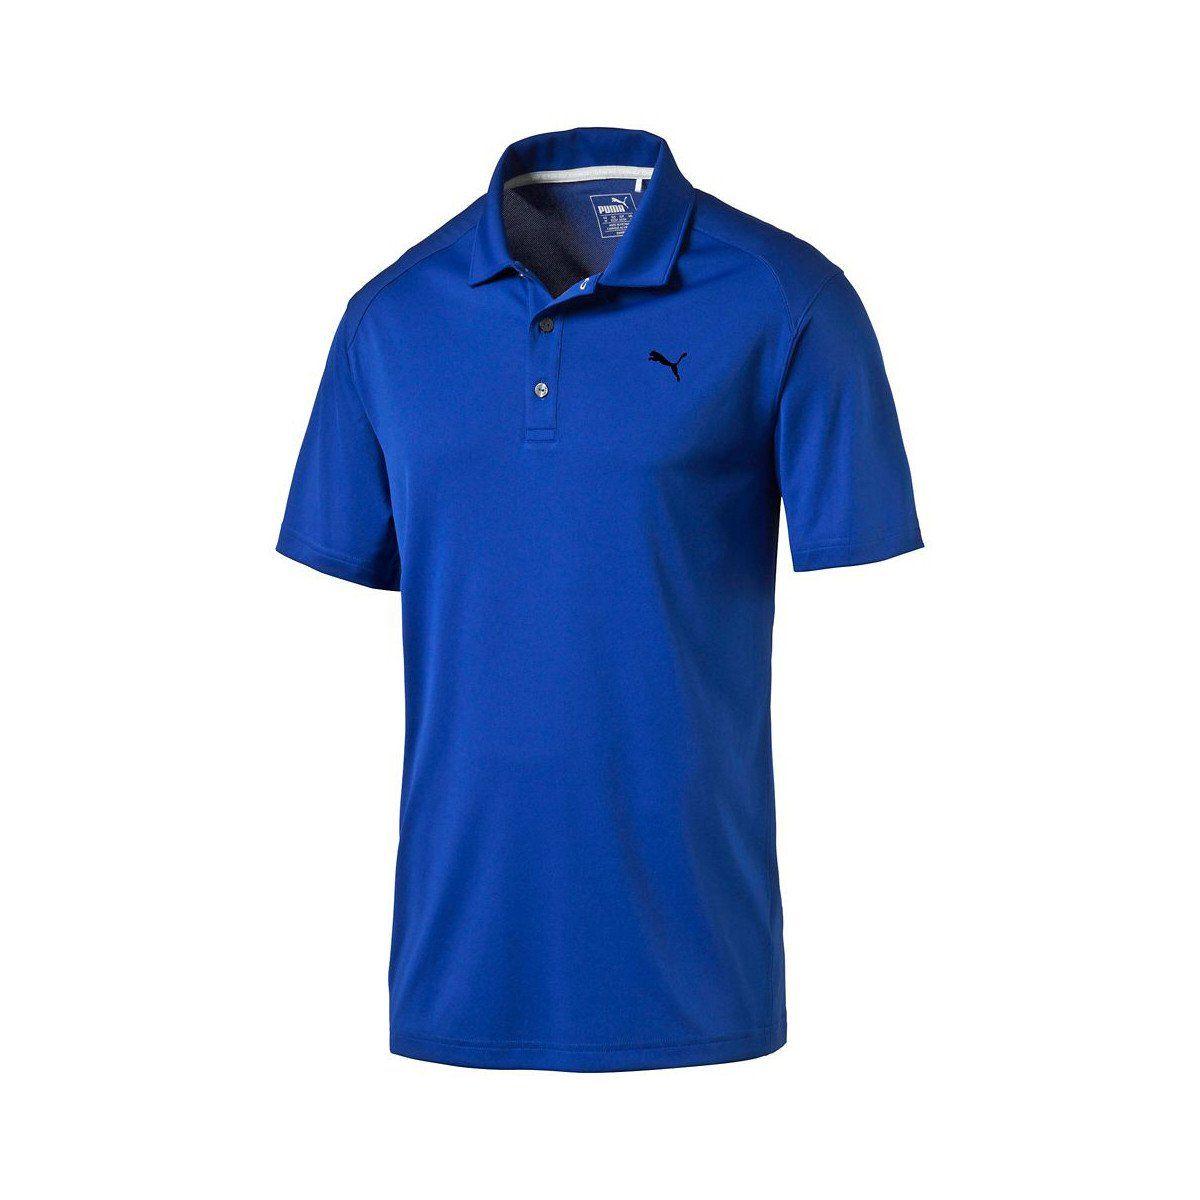 Puma Golf Men's Surf the Web Blue Essential Pounce Golf Polo